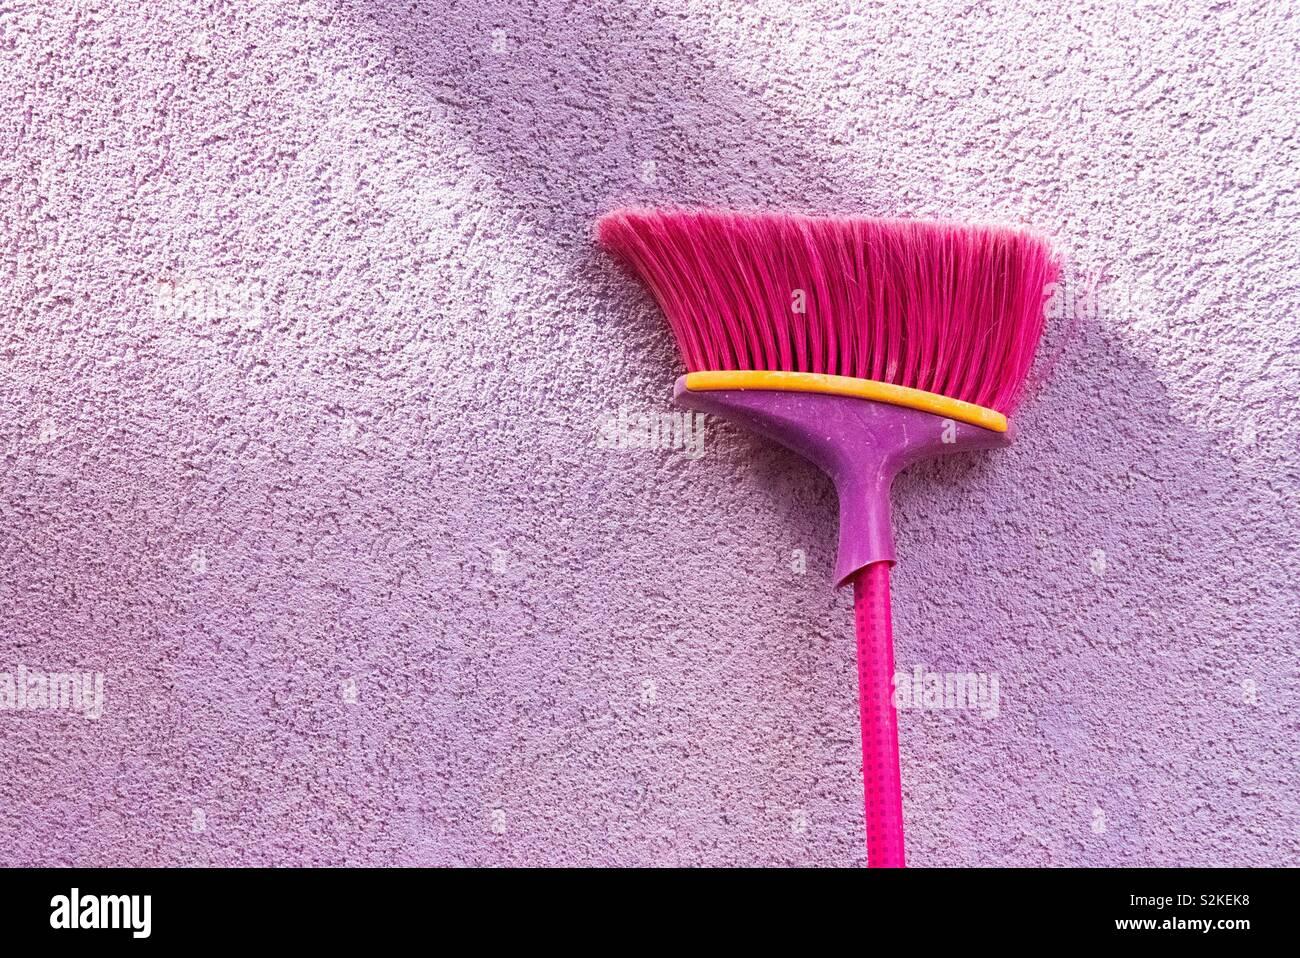 Purple brush against purple wall - Stock Image